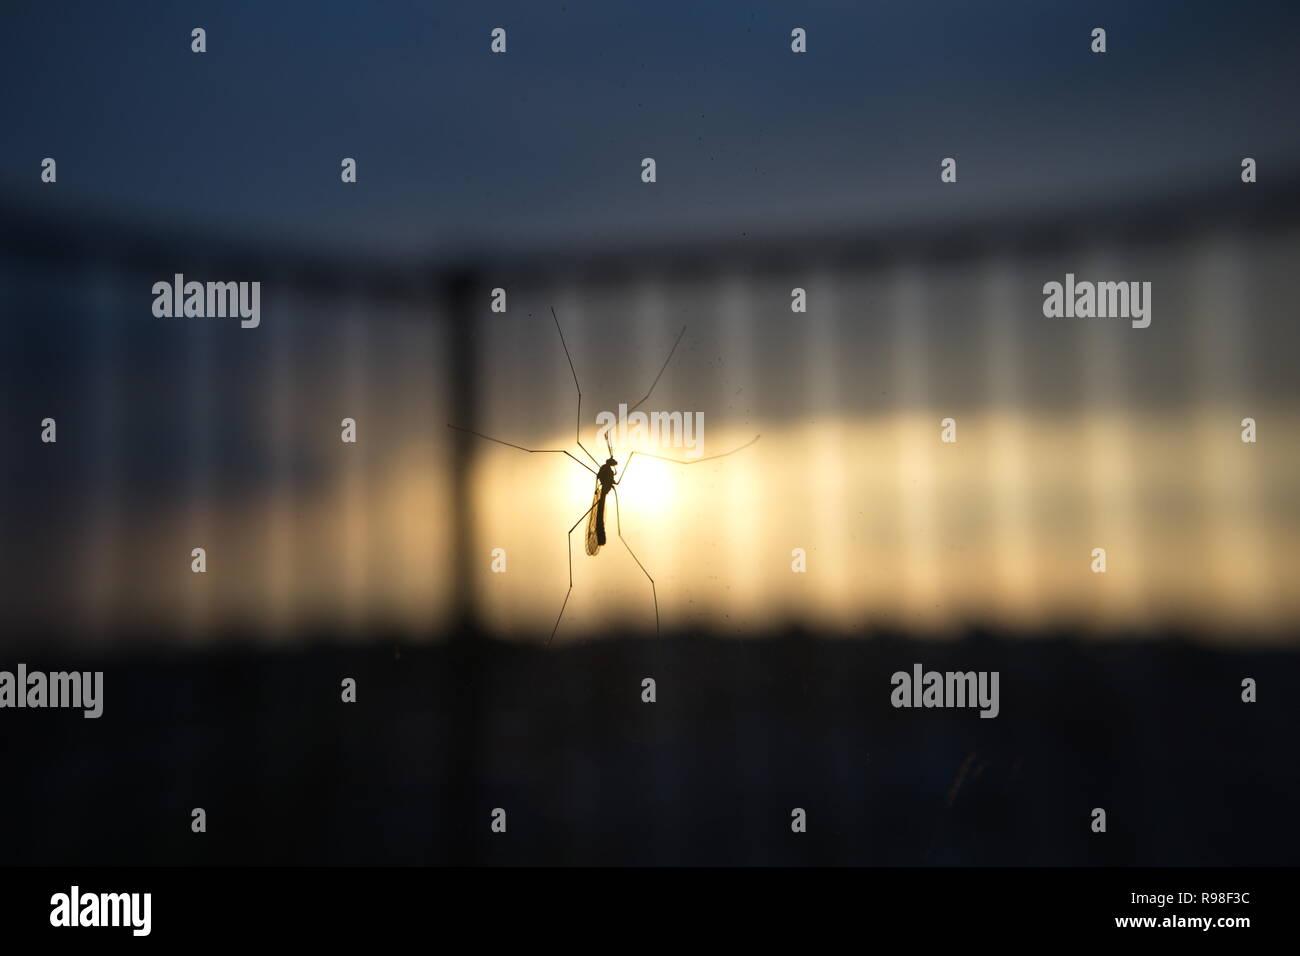 photo - Stock Image